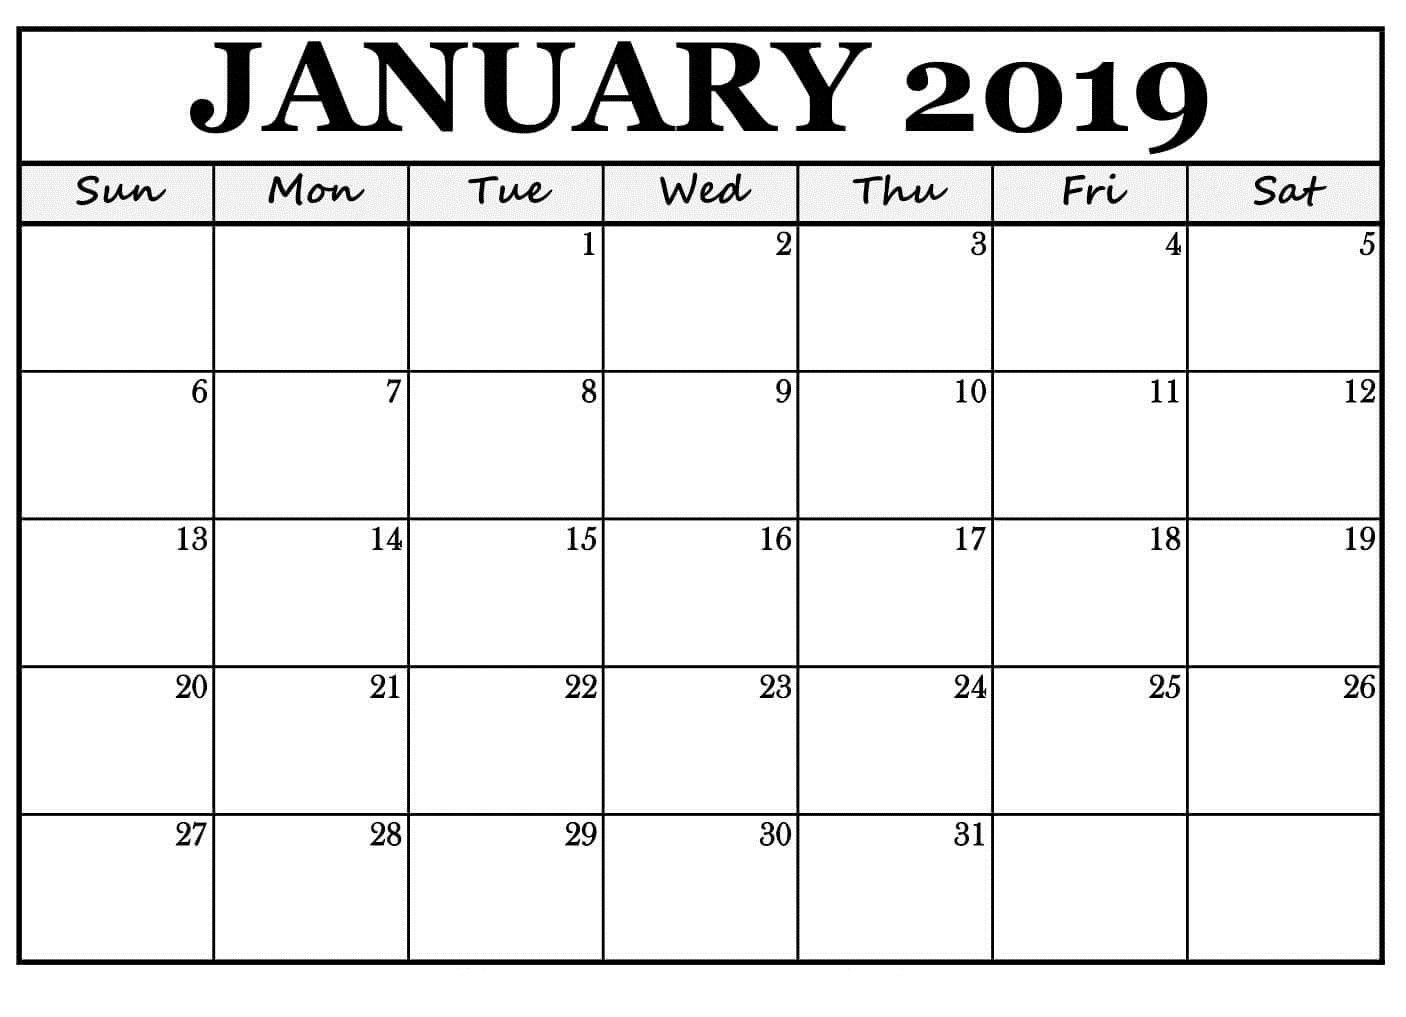 January 2019 Calendar Reminders Free Template   January 2019 Calendar 2019 January Pdf